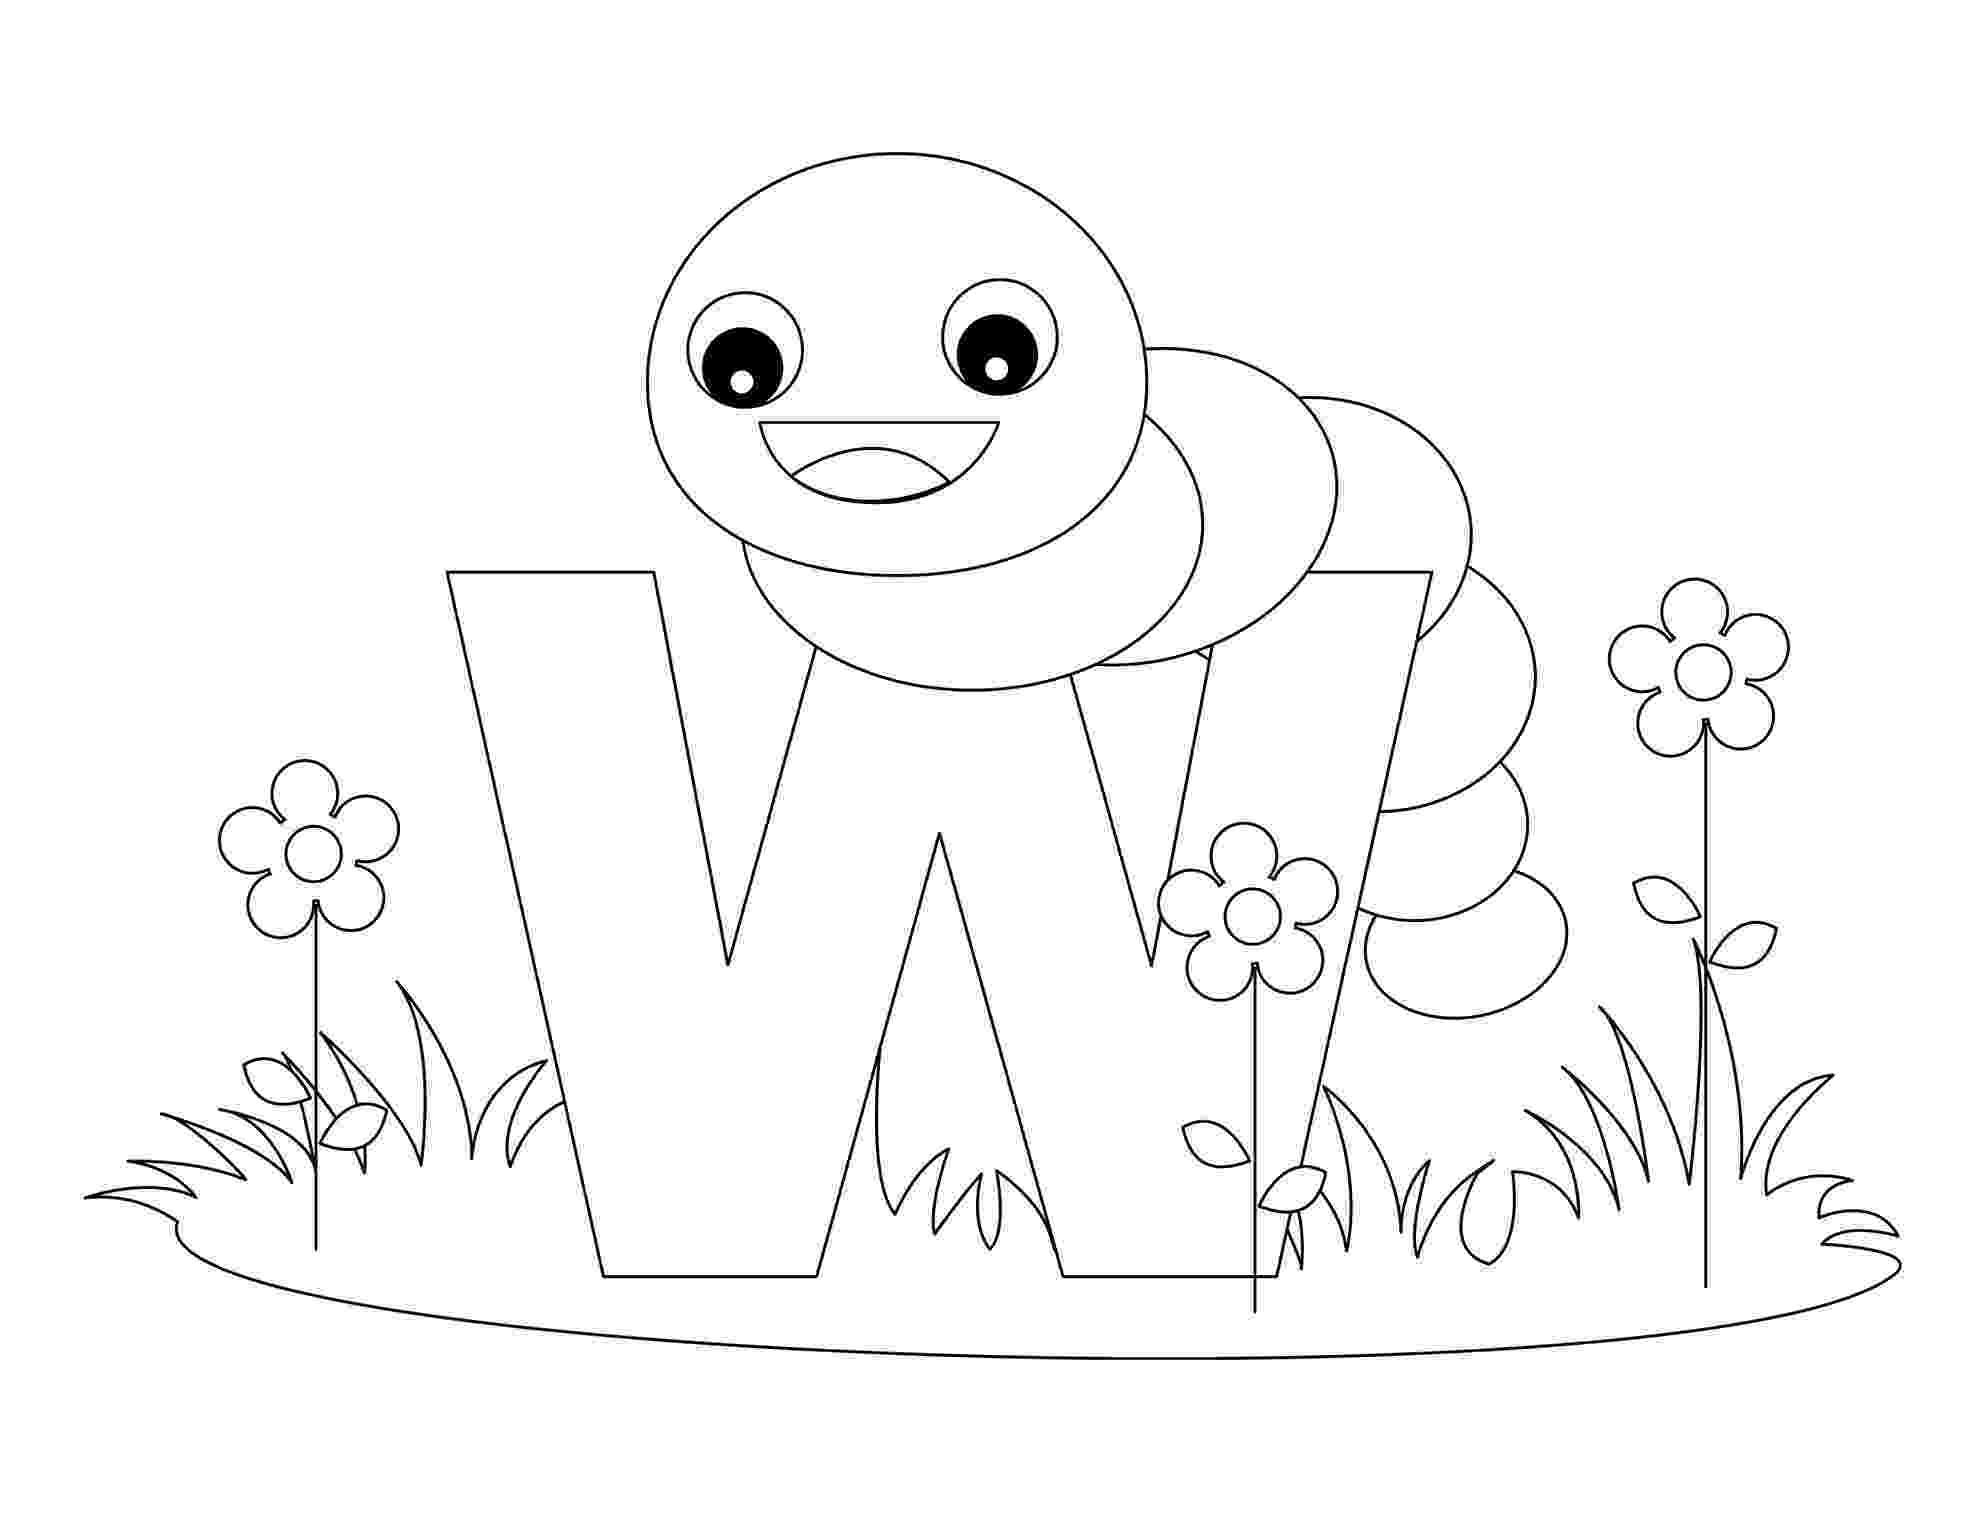 abc coloring sheets free printable alphabet coloring pages for kids best coloring sheets abc 1 3